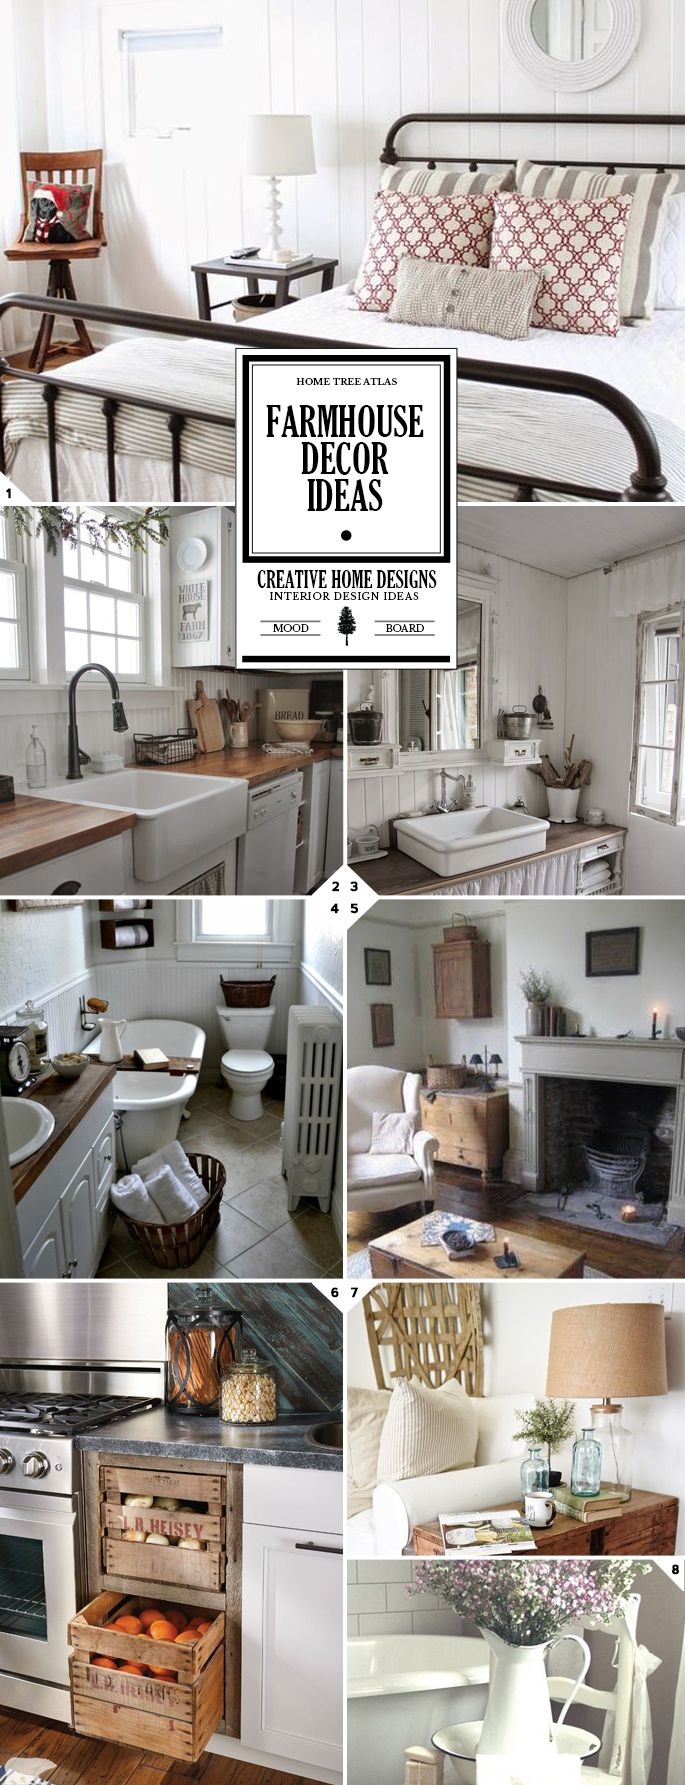 Vintage And Rustic Farmhouse Decor Ideas Design Guide